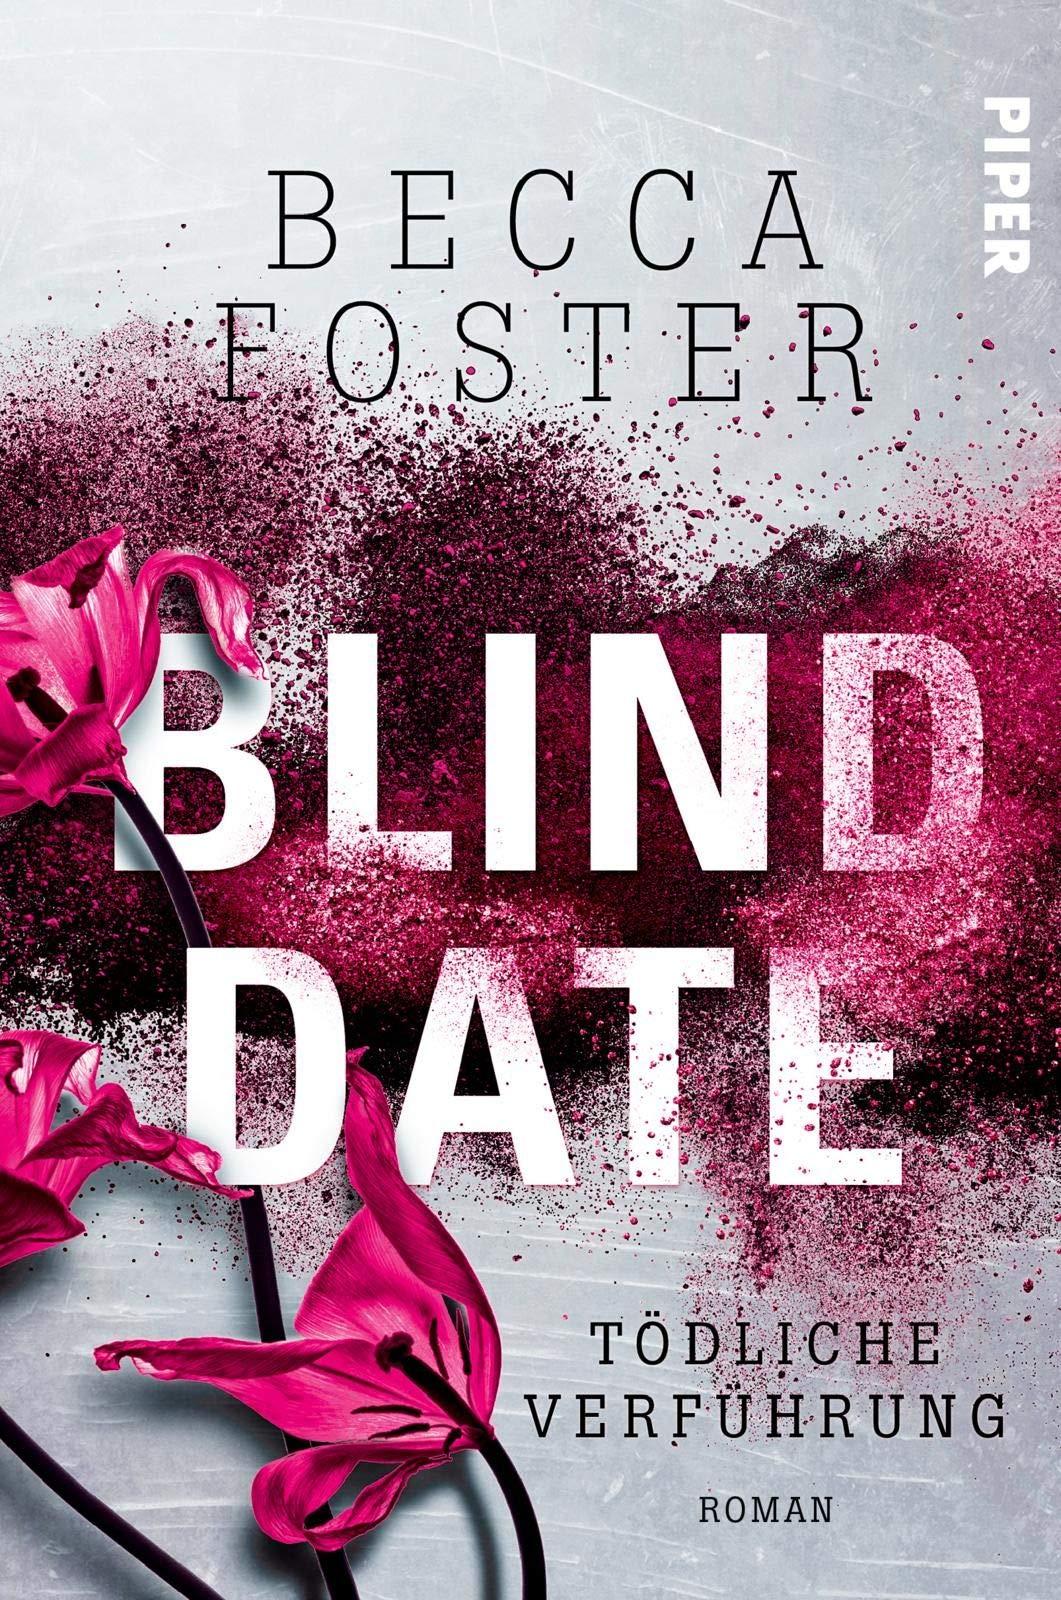 Blind Date in the Dark (32-48 Jahre) Tickets, Di, 31.03.2020